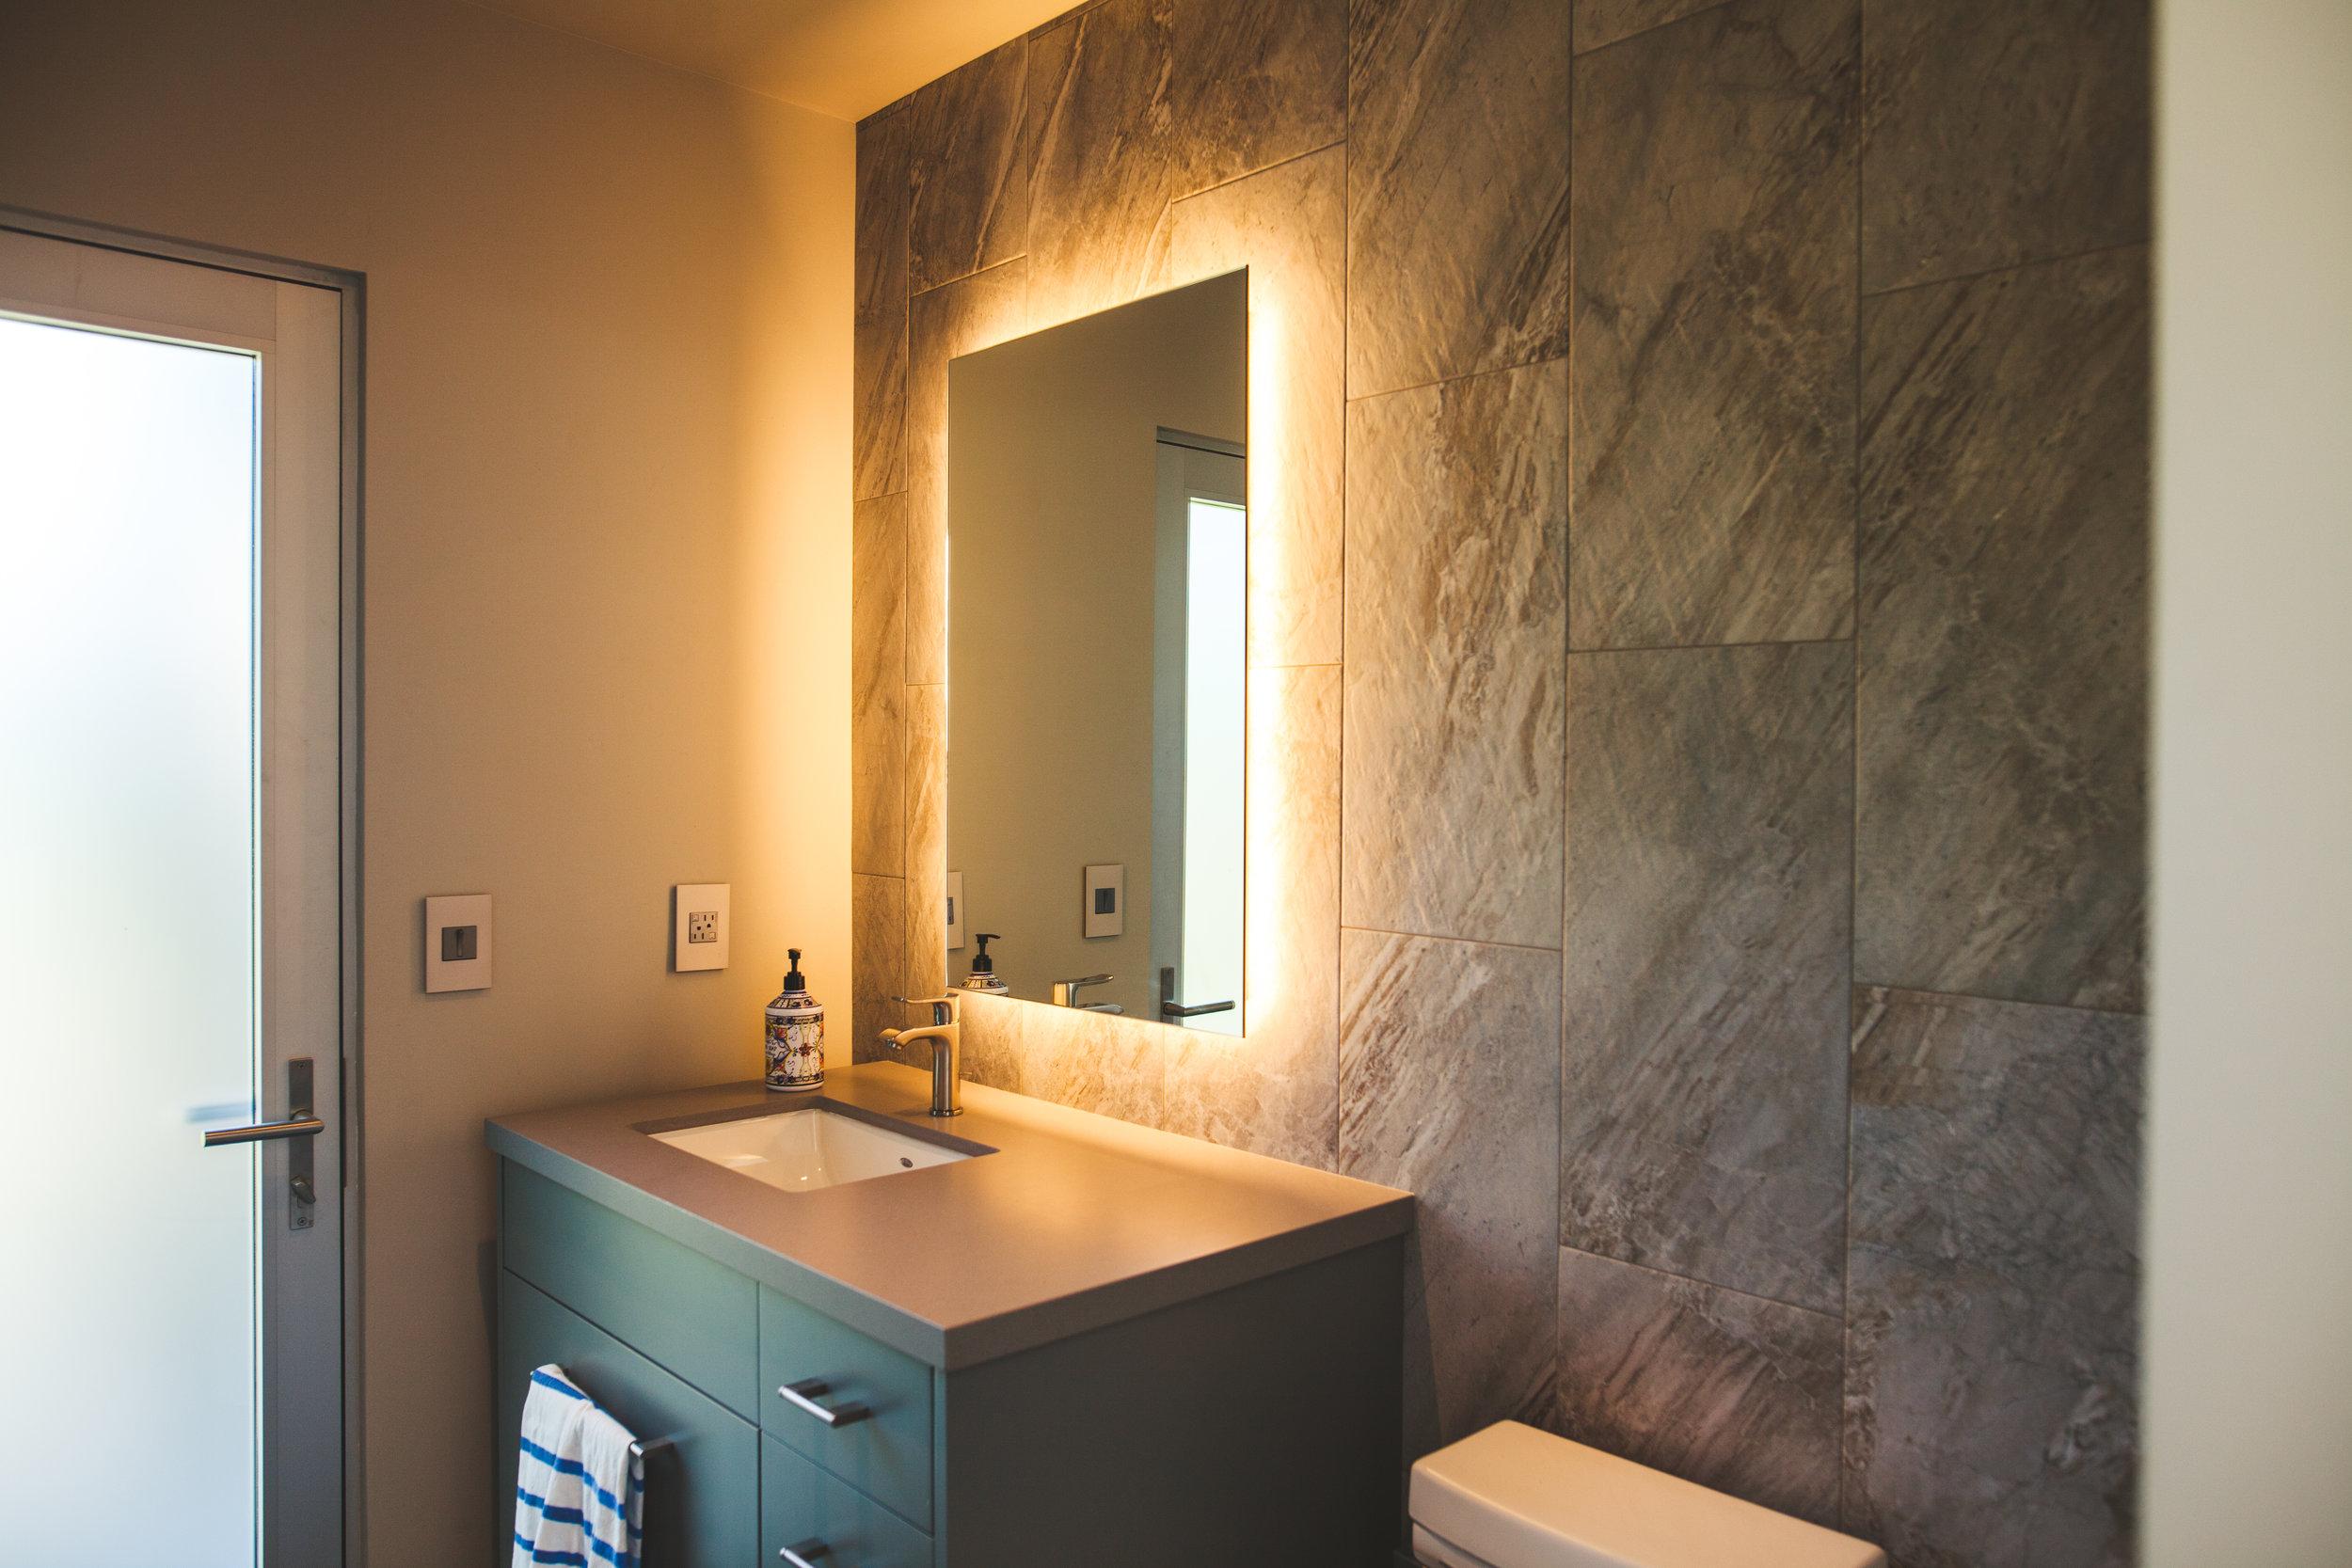 Bathroom-Poolhouse-Gen-M-Architecture.jpg